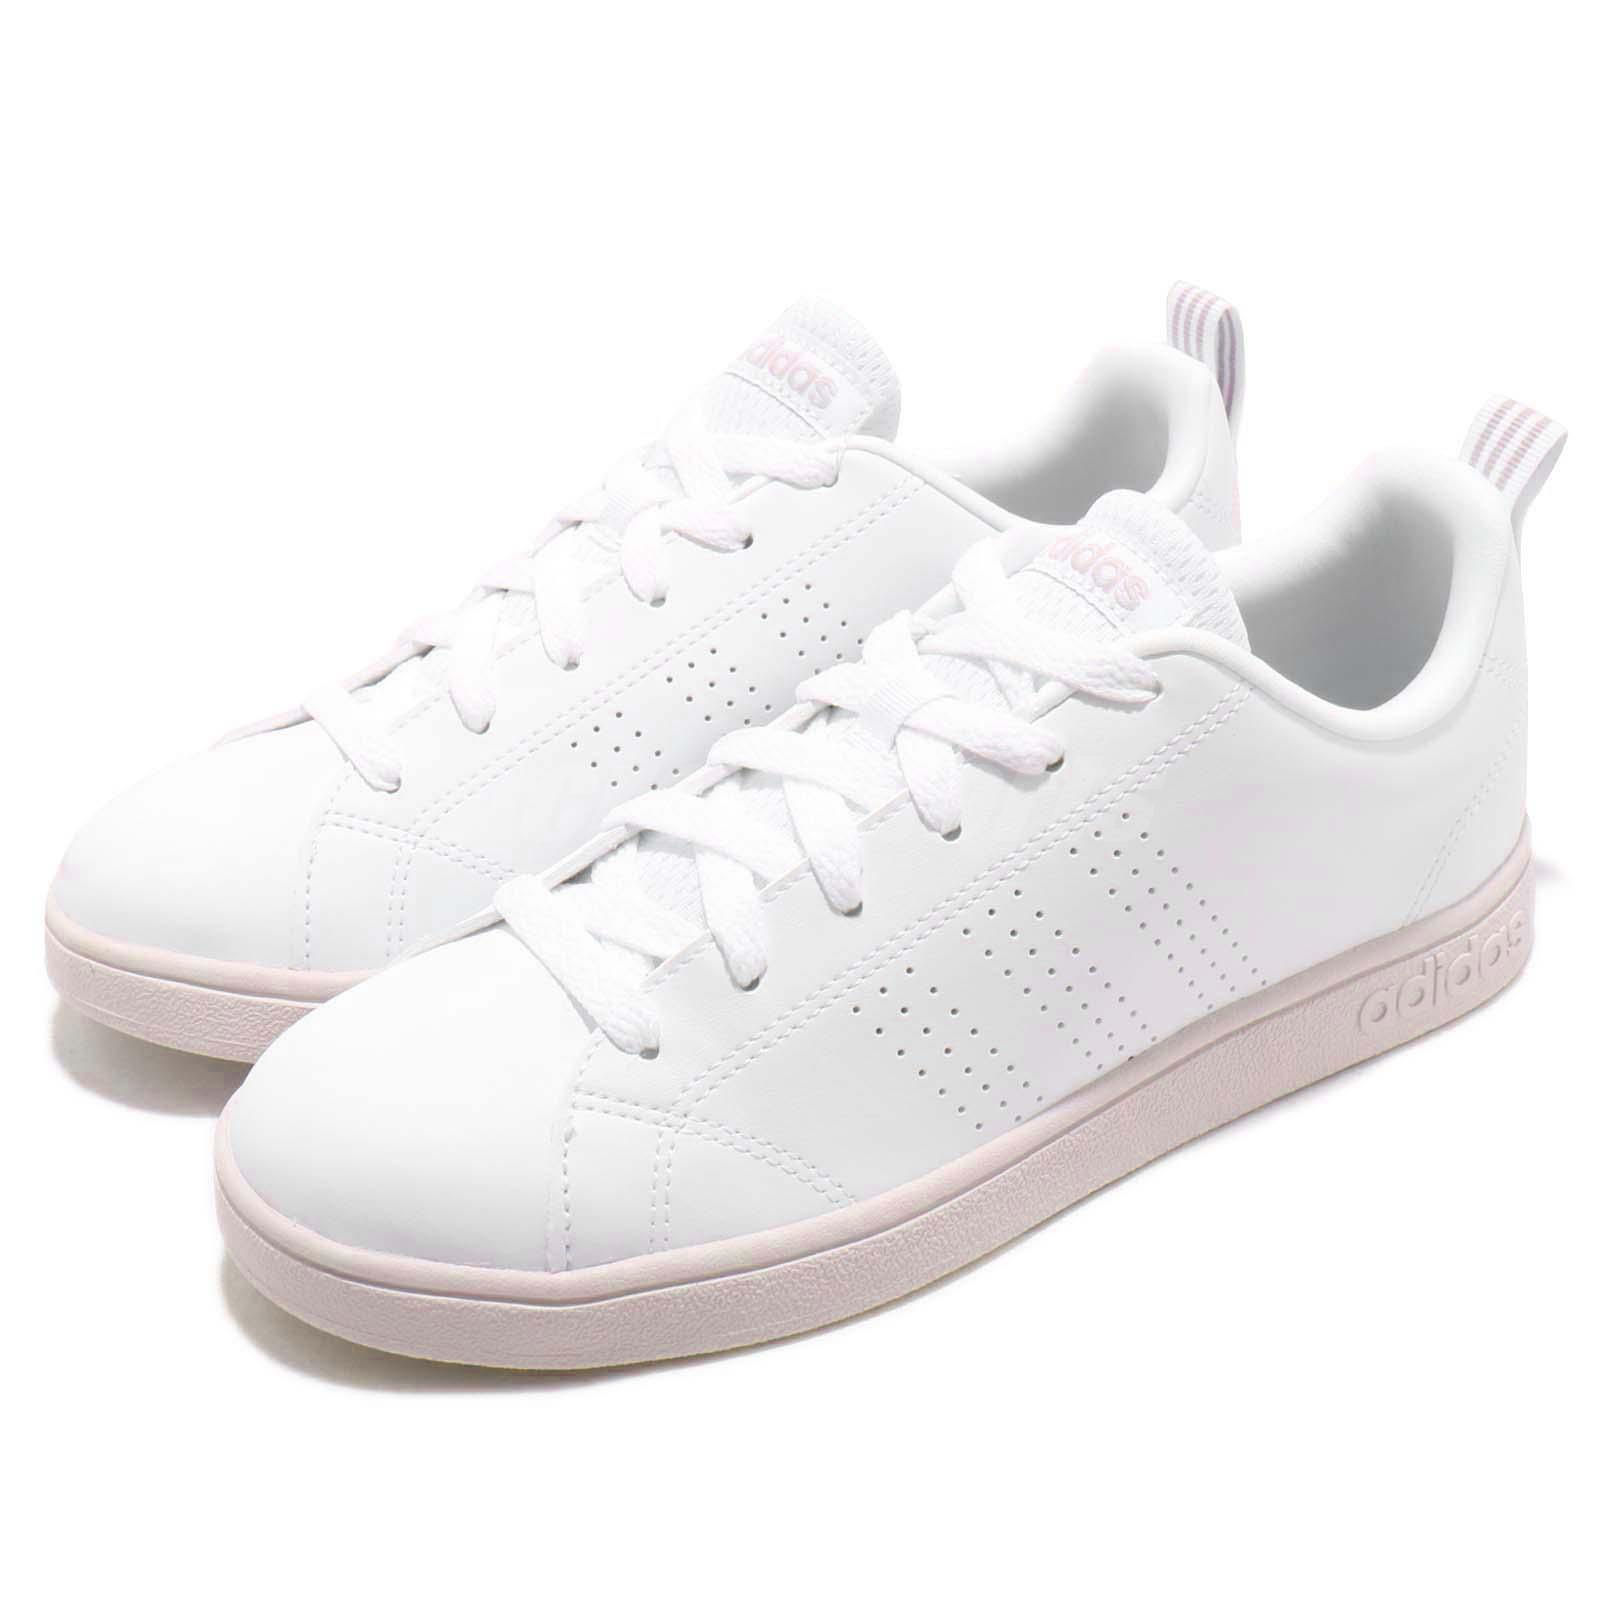 87c436c4a65 adidas Neo VS Advantage CL White Ice Purple Women Lifestyle Casual ...